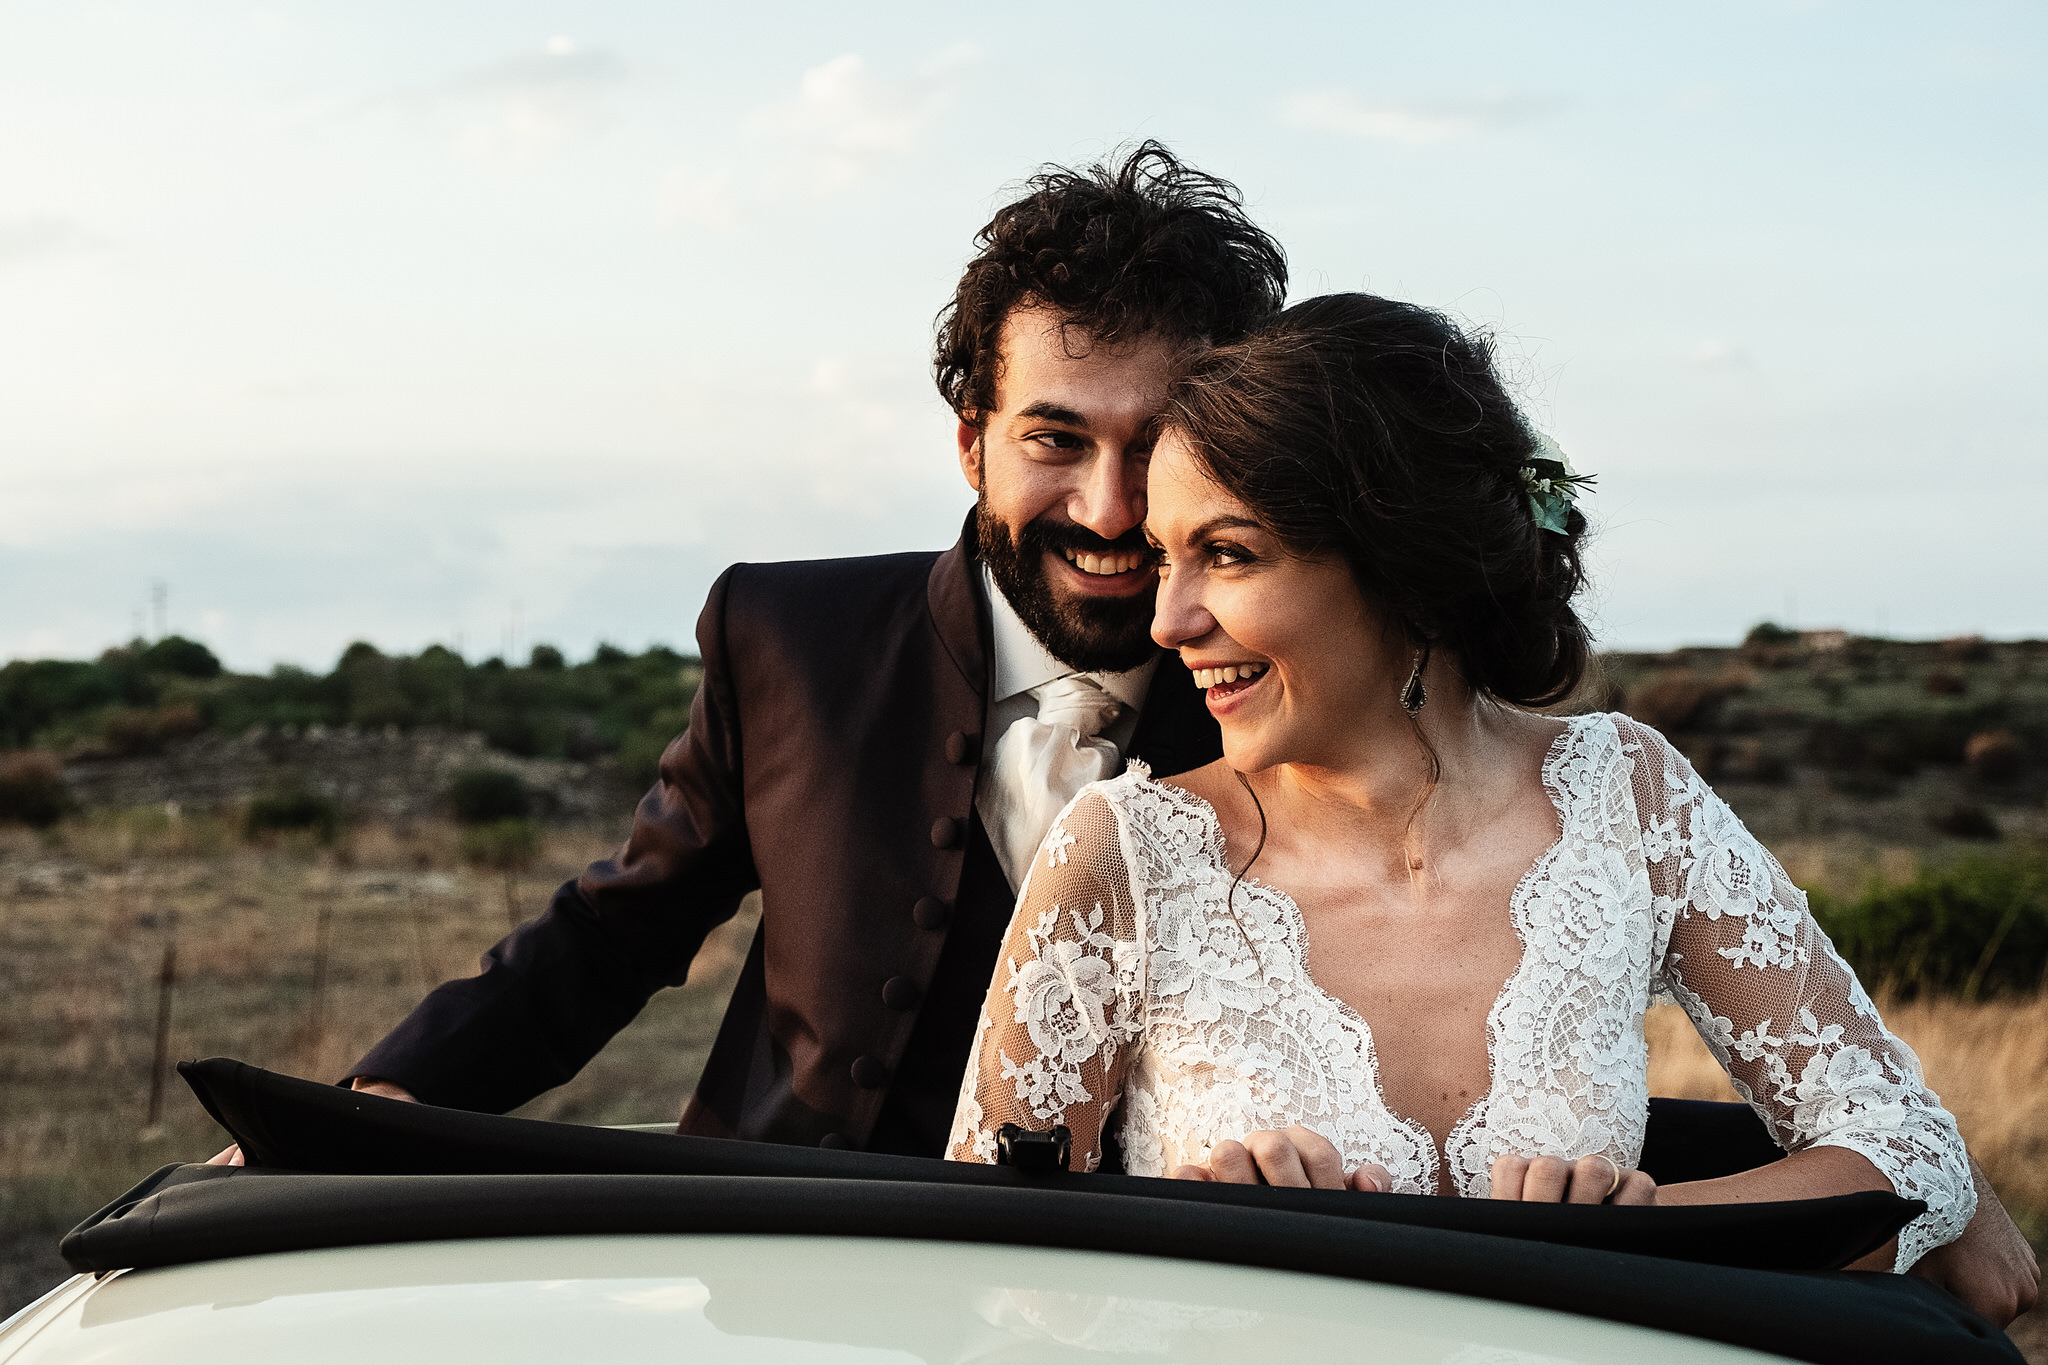 Emanuele&Francesca